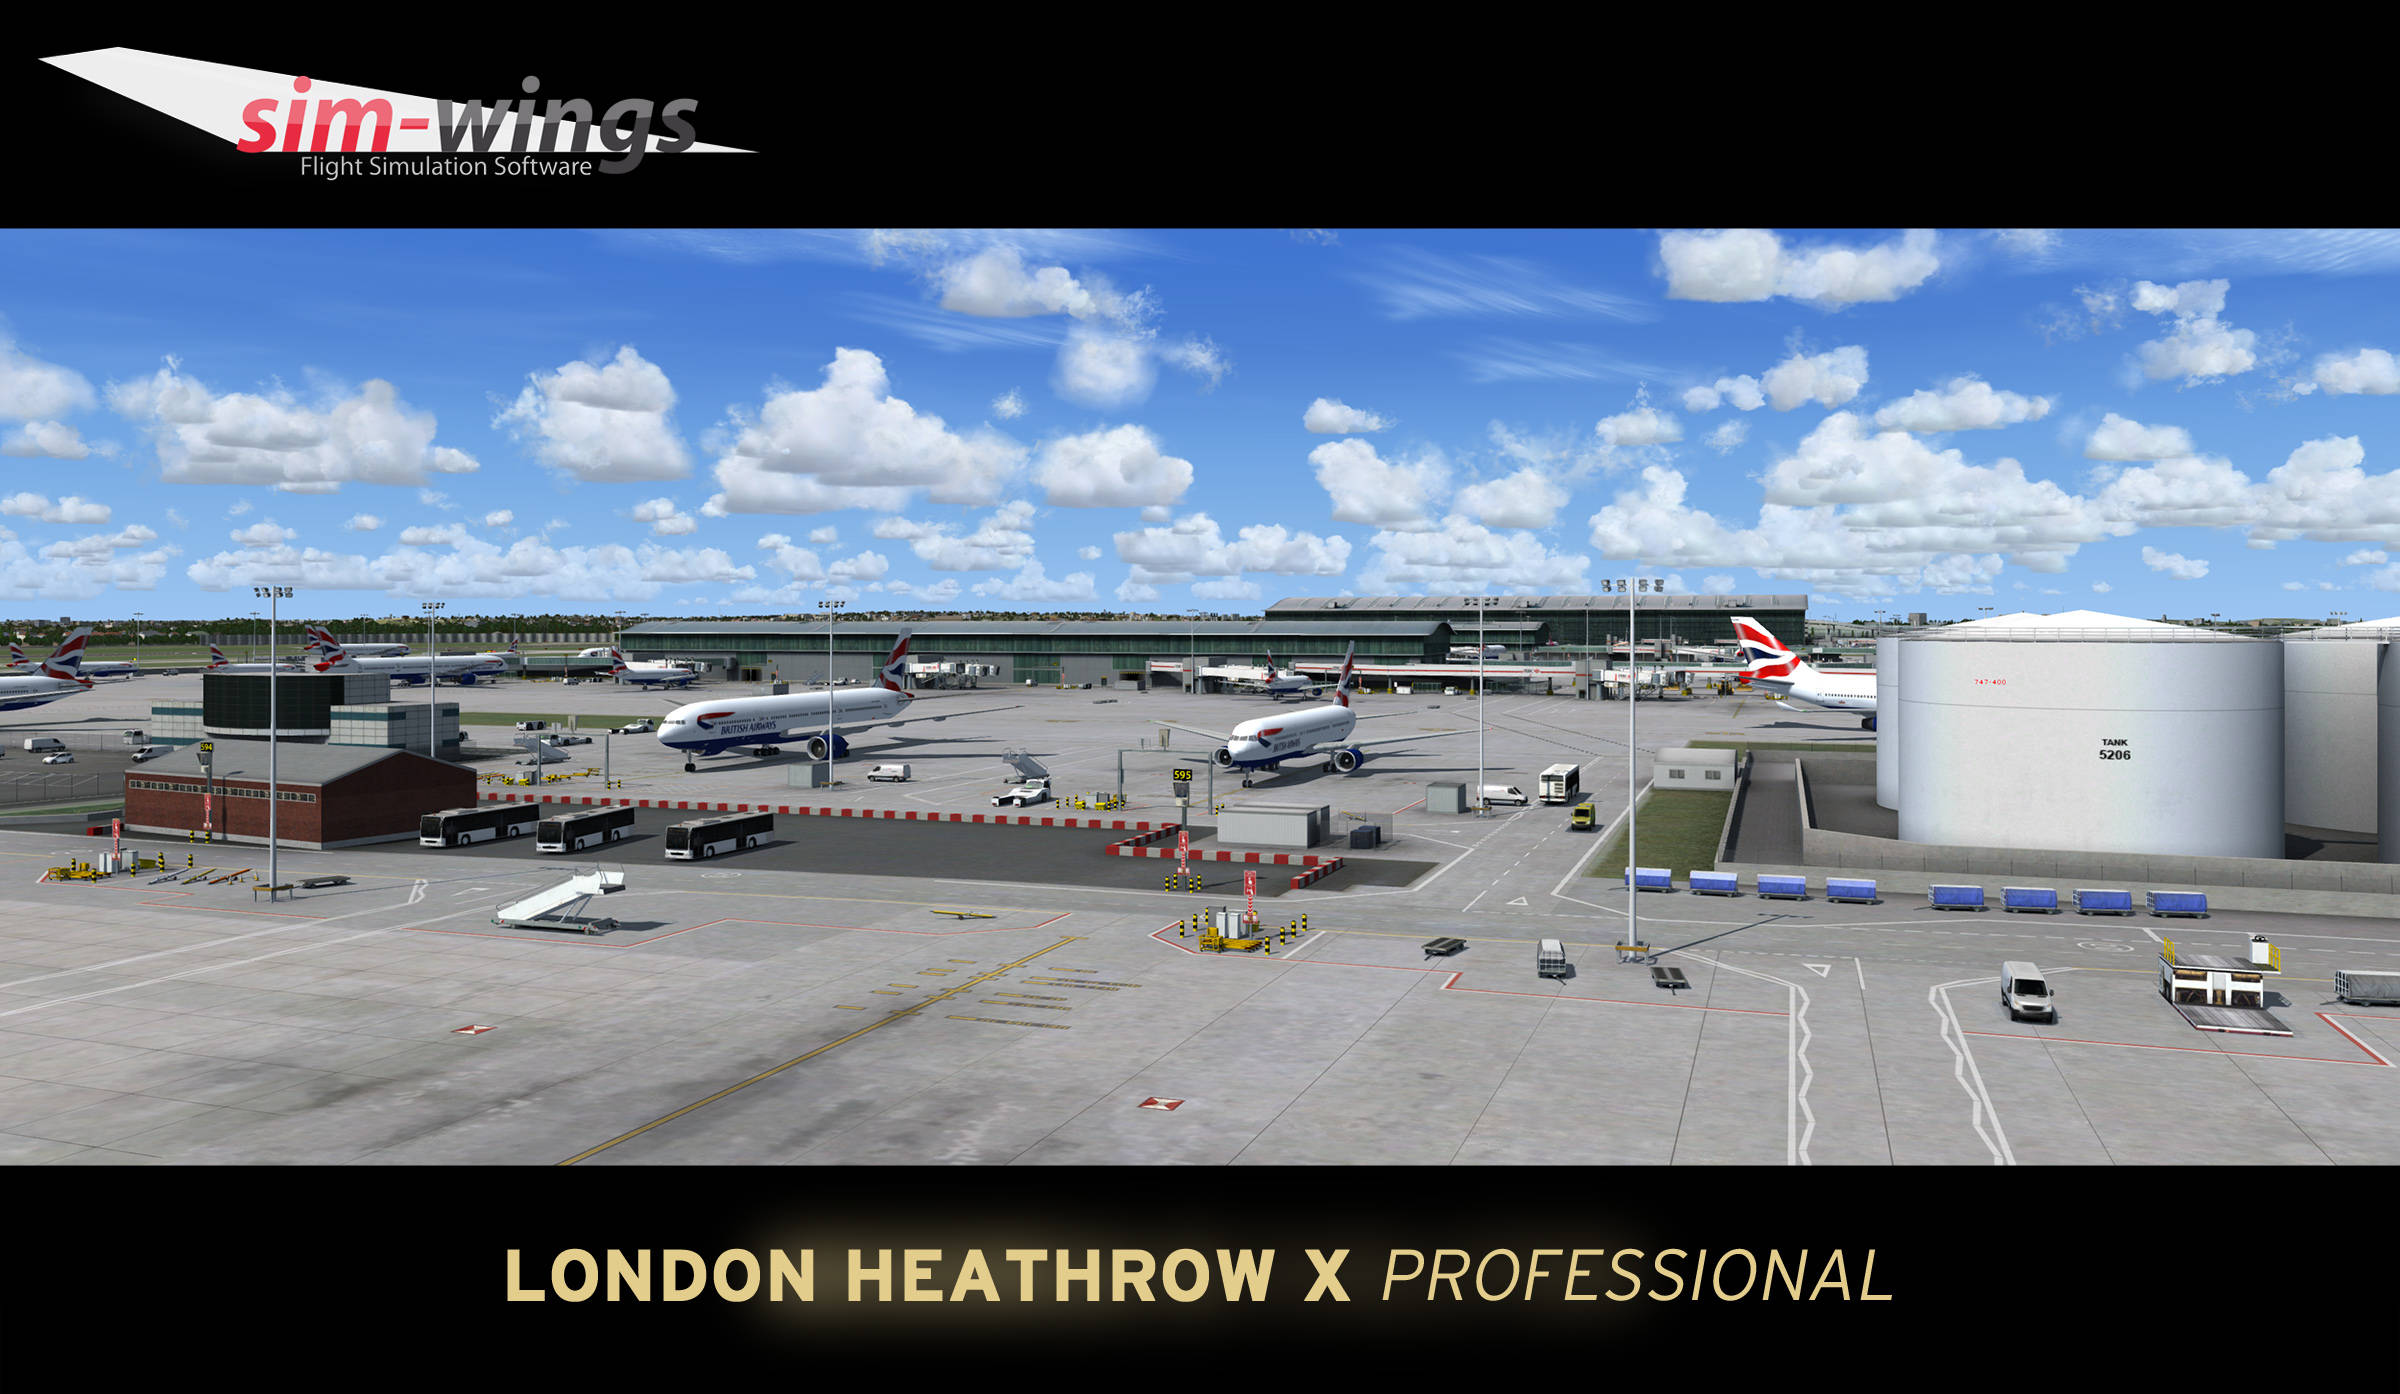 https://dxhb0it26is40.cloudfront.net/productimages/mega-airport-london-heathrow-professional_4_ss_l_171002125830.jpg